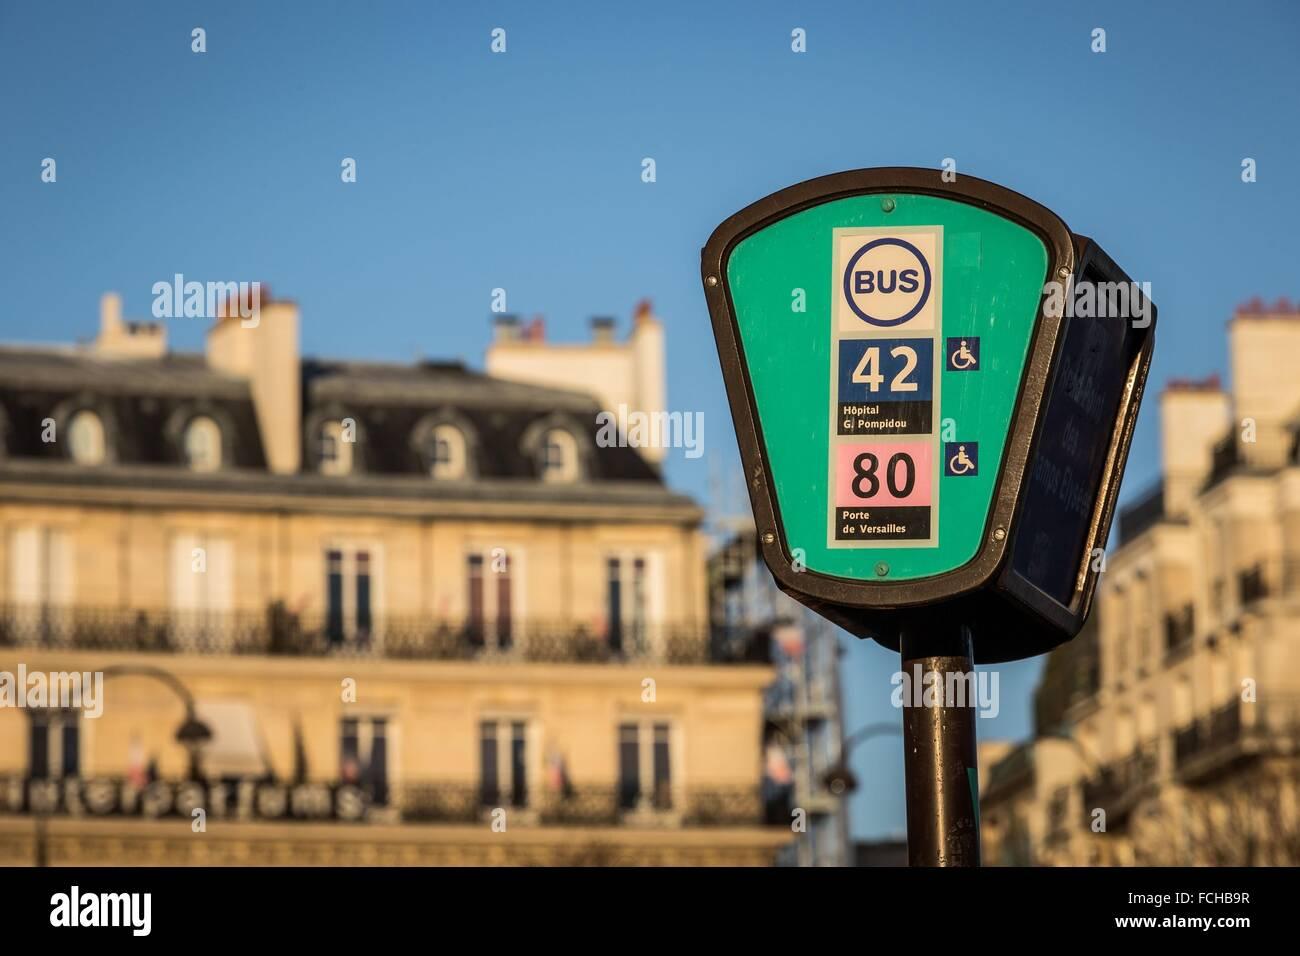 KREISVERKEHR AUF DEM CHAMPS-ÉLYSÉES IN PARIS, FRANKREICH Stockbild